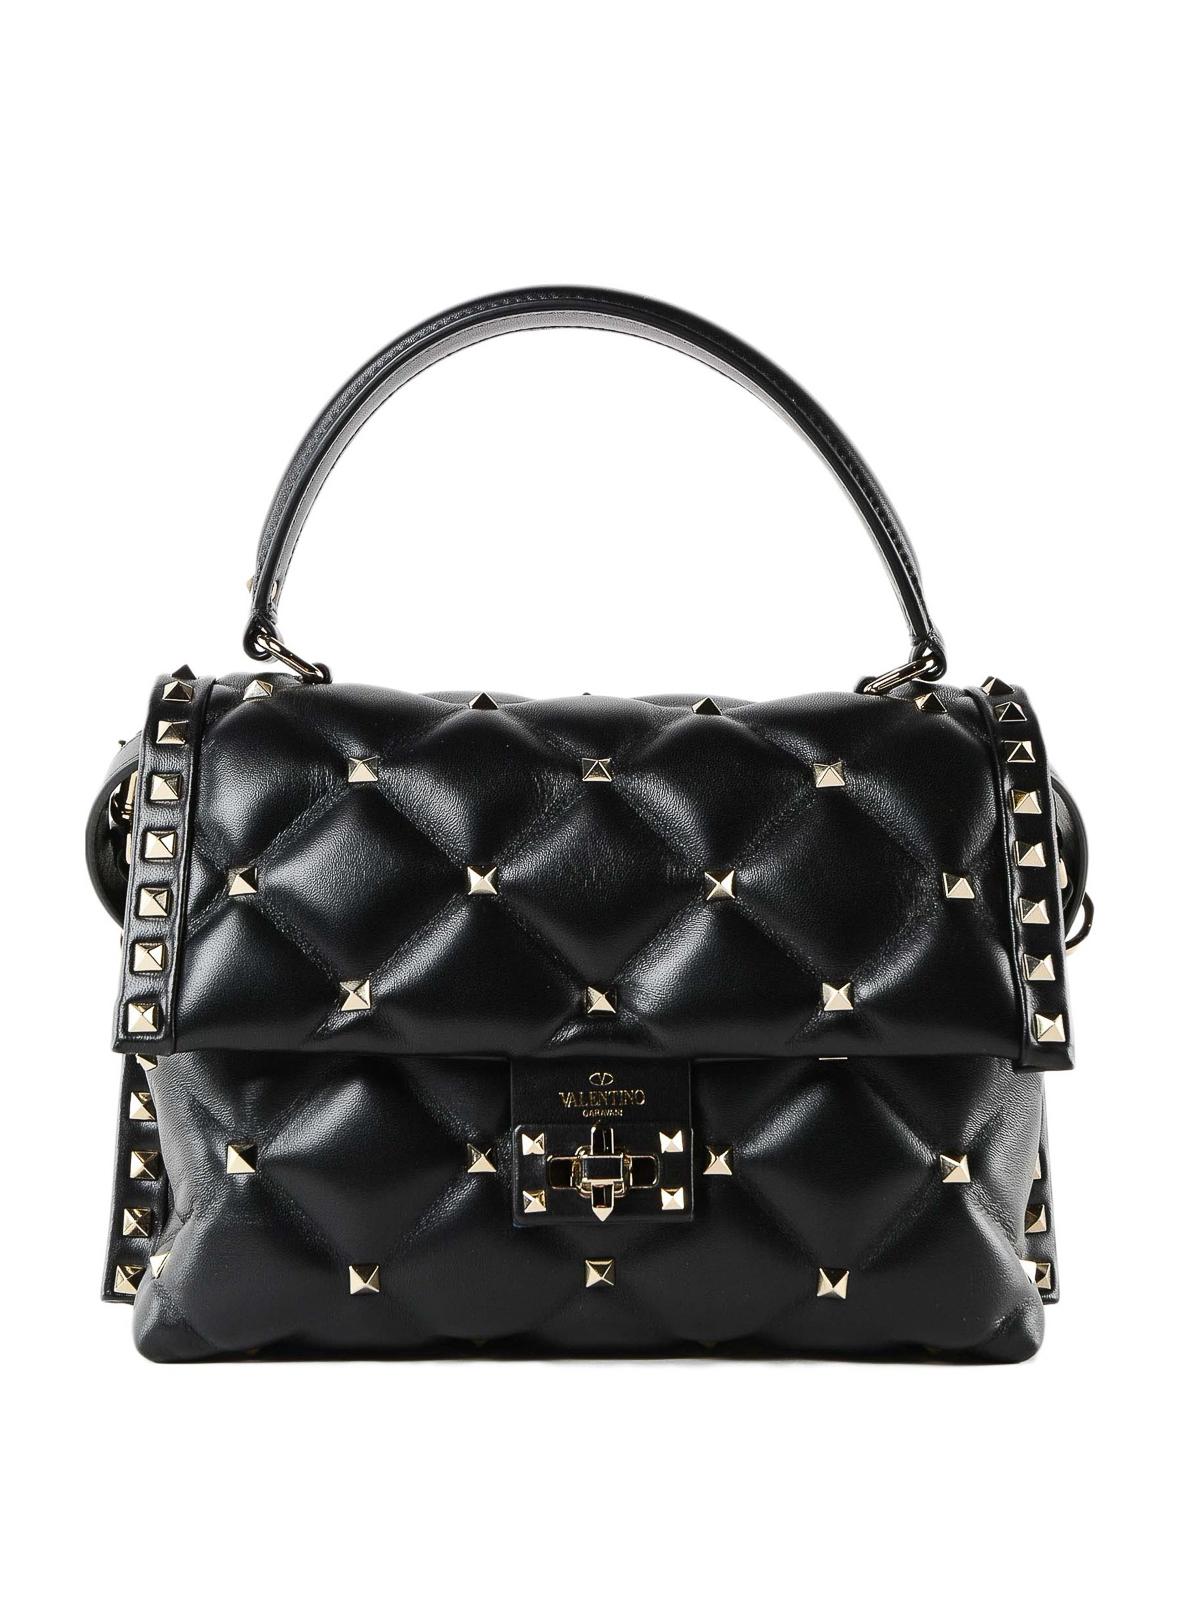 da682391a69f VALENTINO GARAVANI  bowling bags - Candystud quilted calfskin small handbag